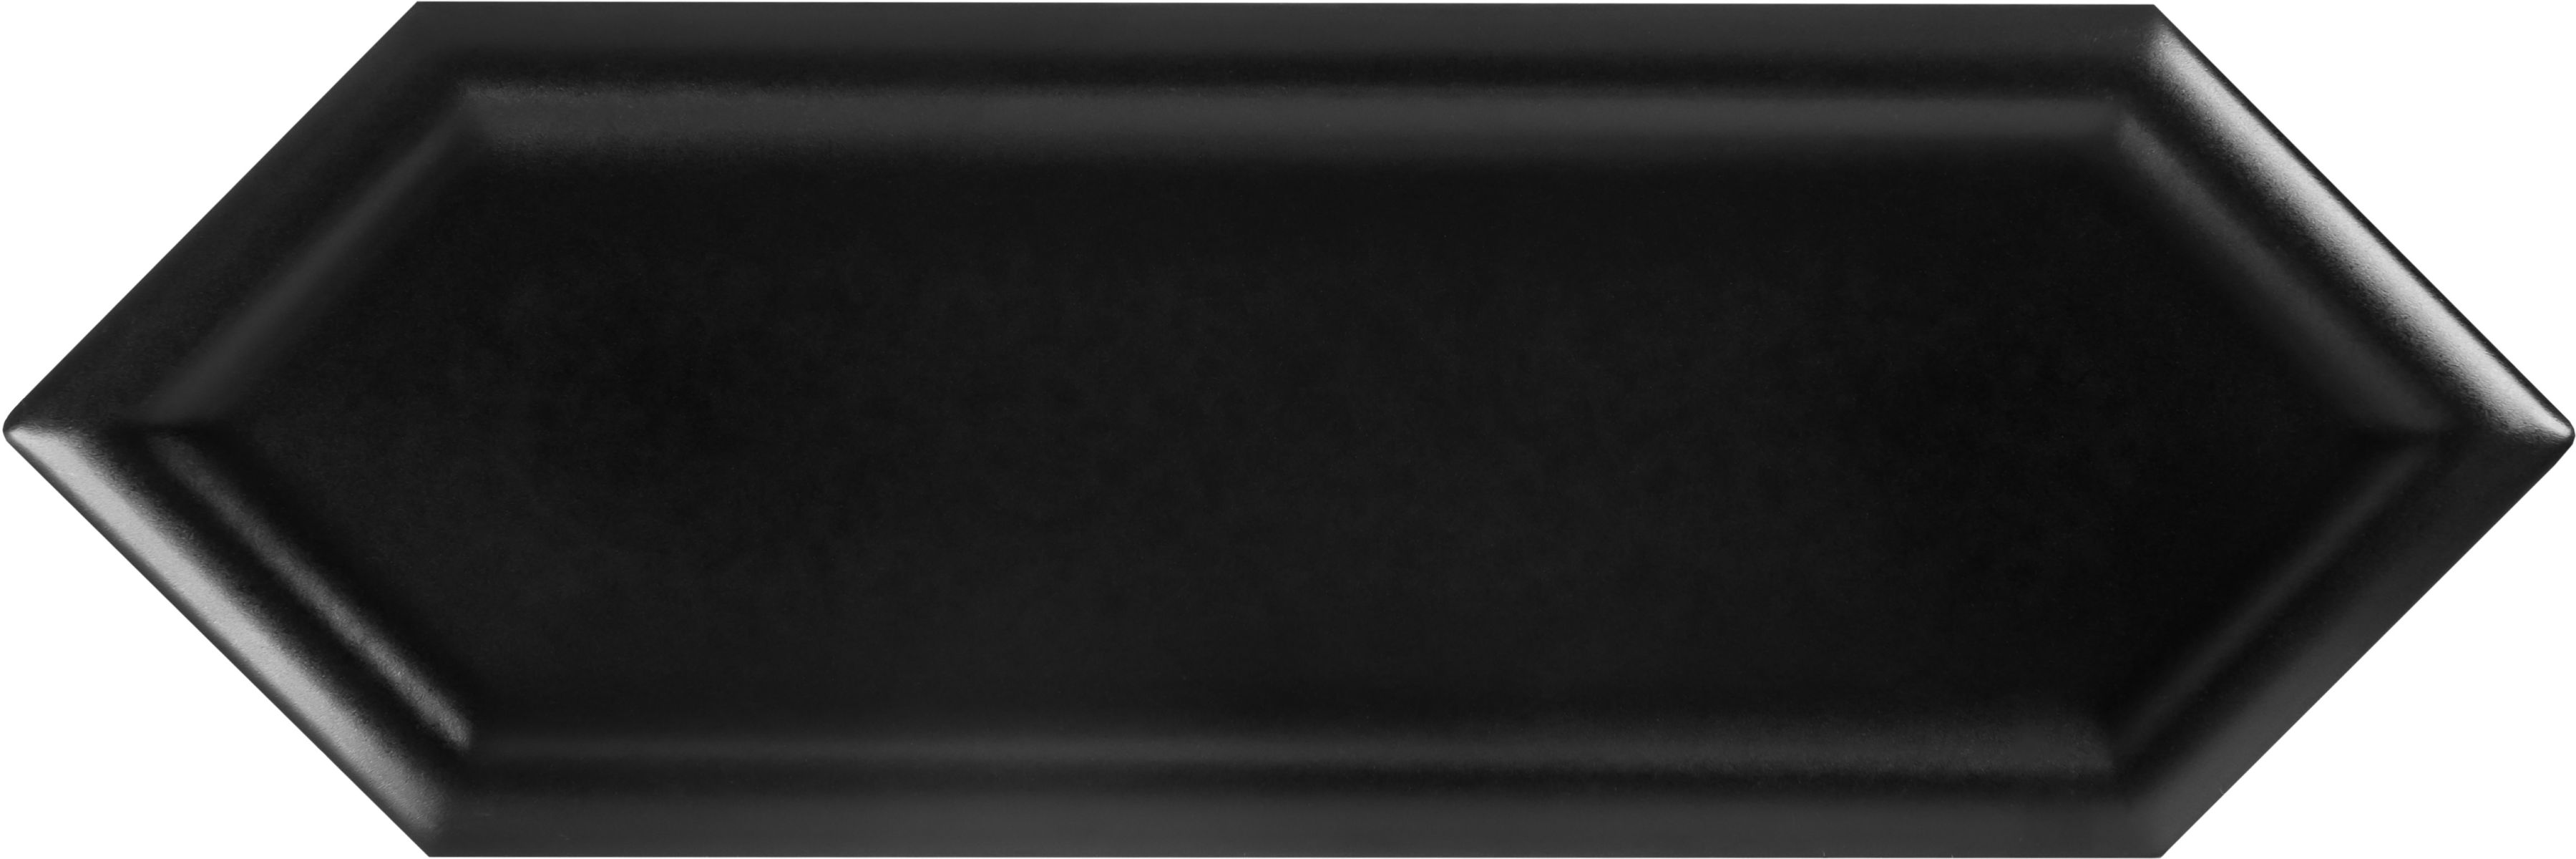 Dunin Tritone Black Matt 02 7,5x22,7 płytka ścienna